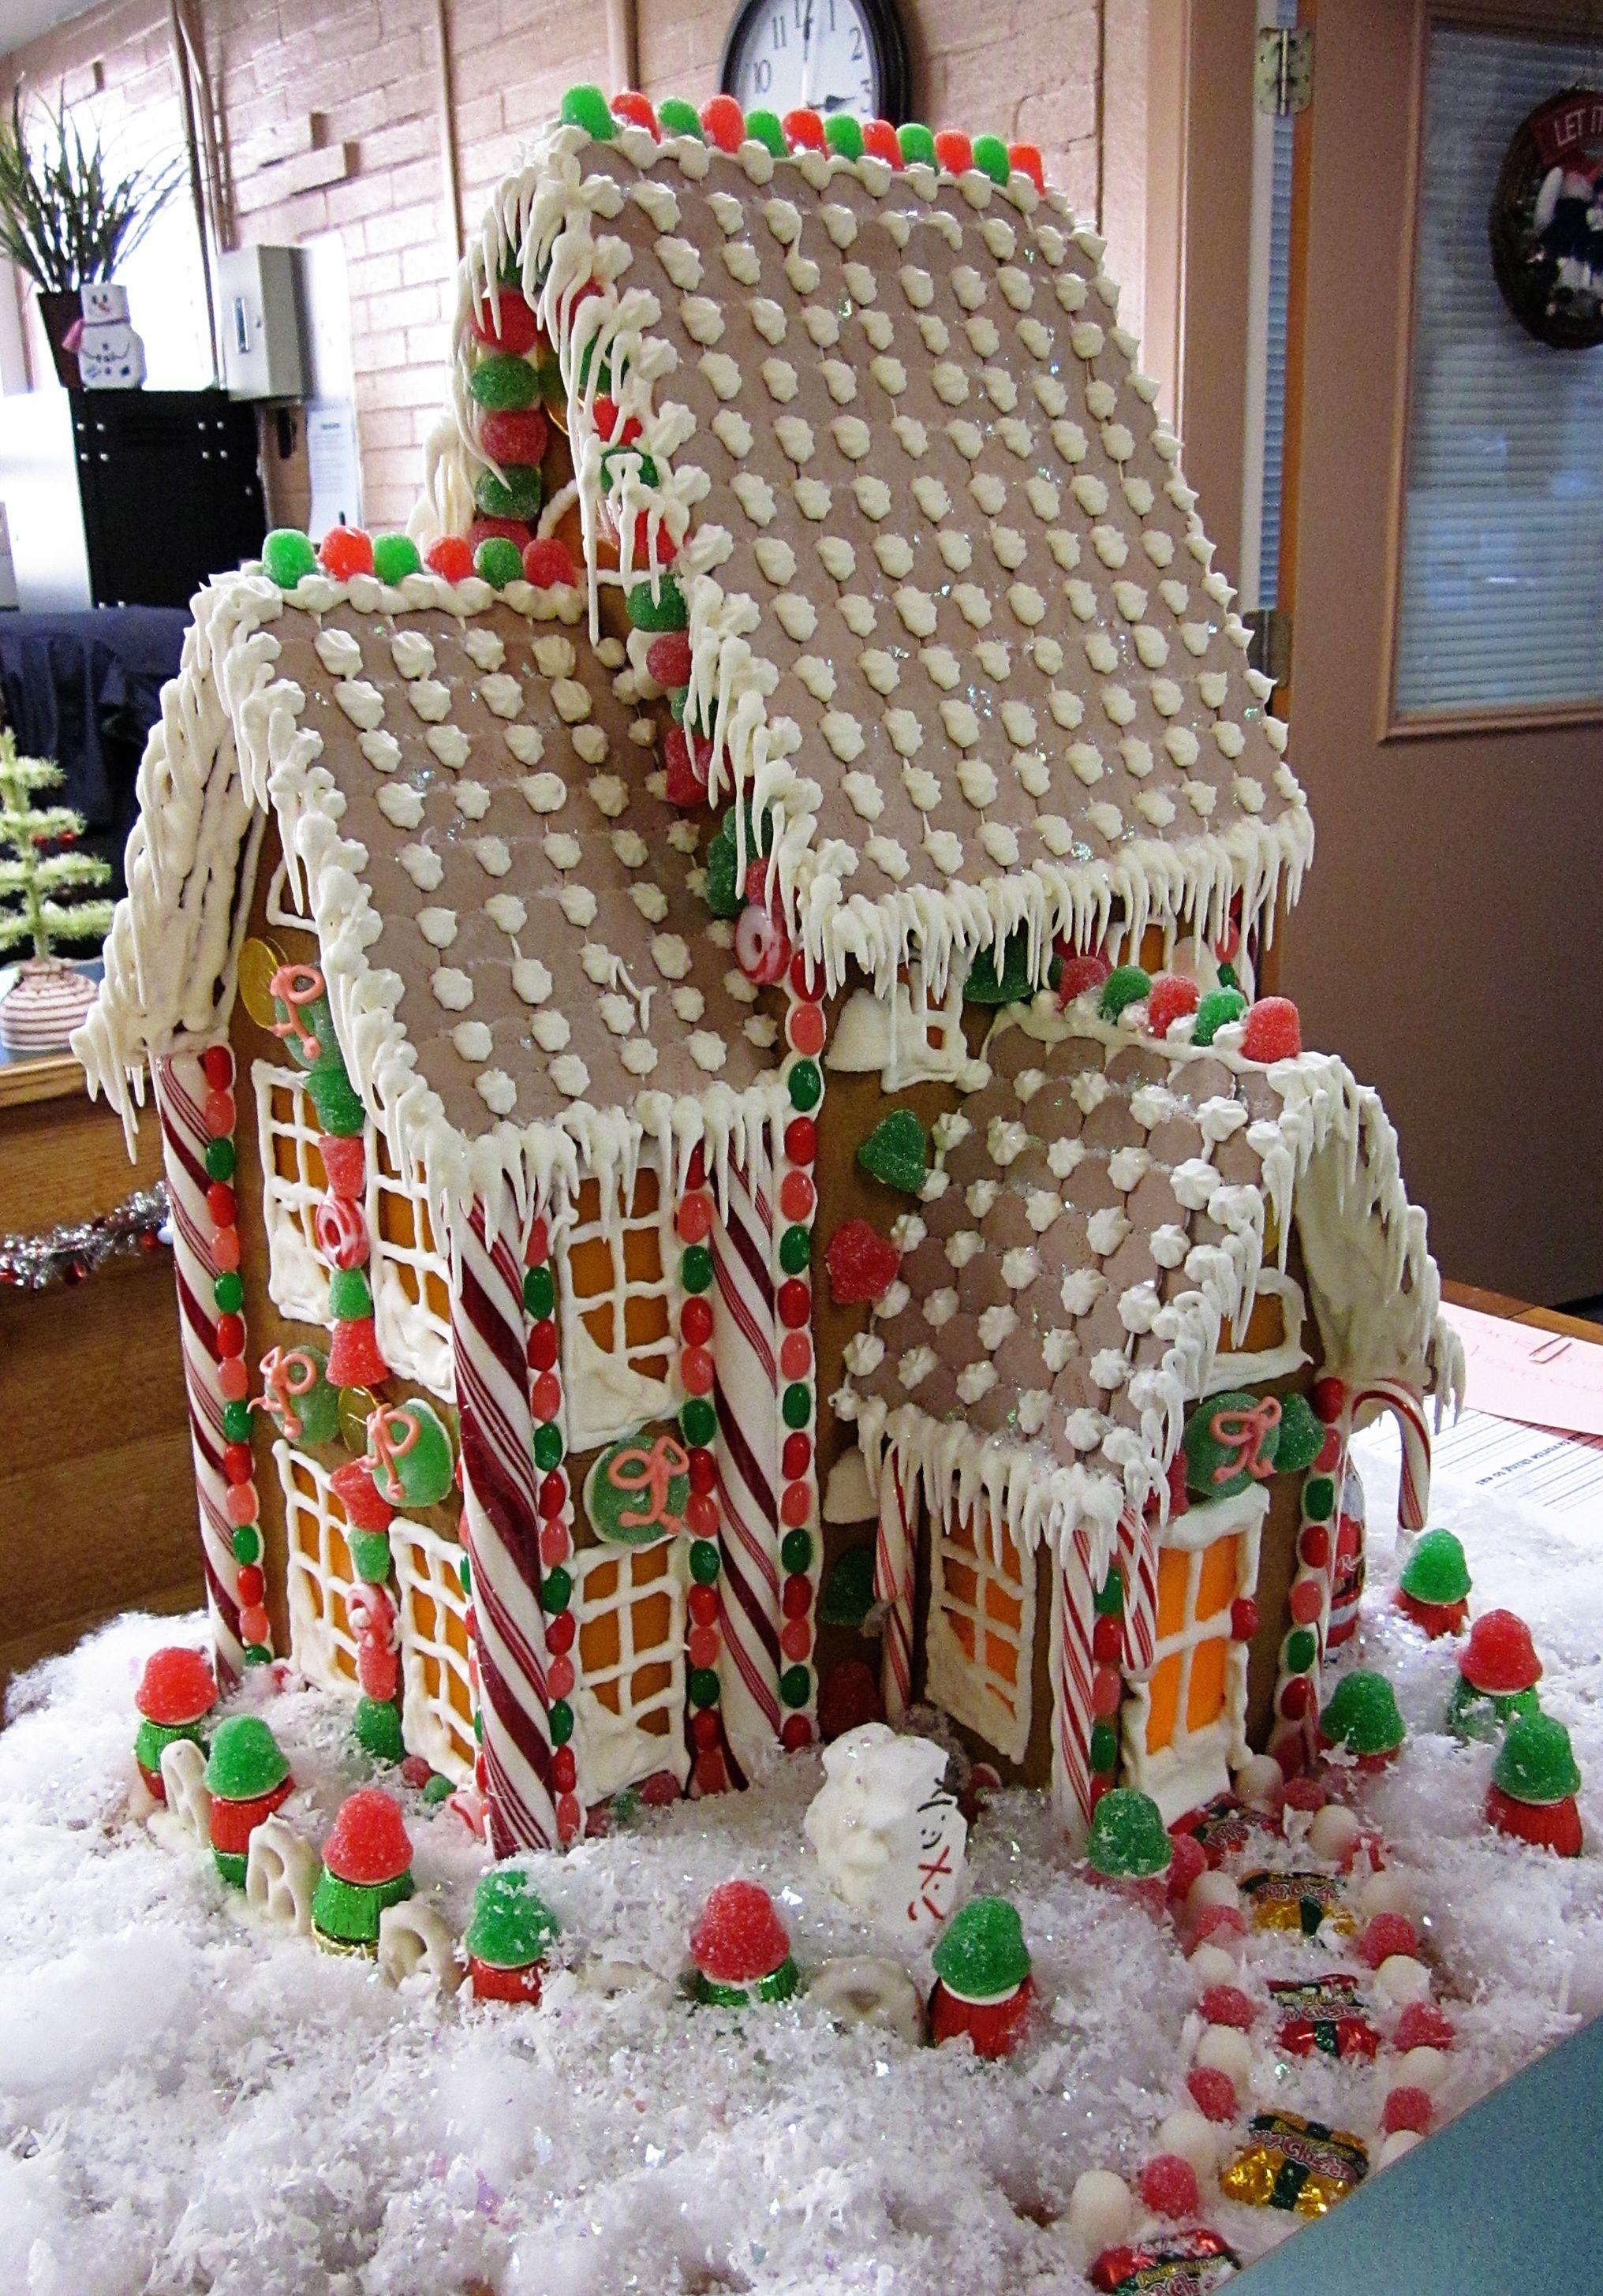 casitas navideñas de jengibre